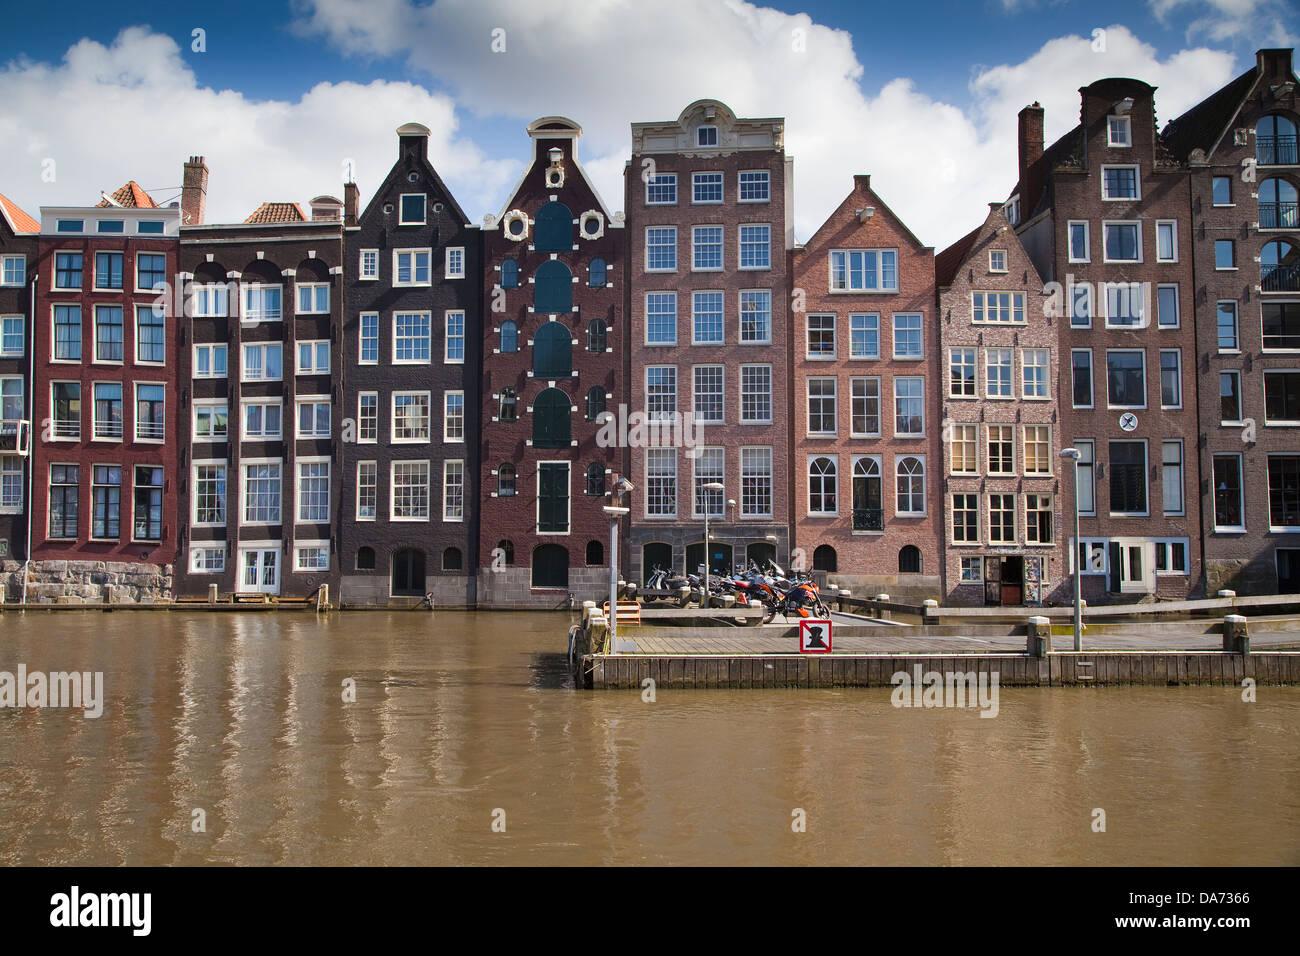 Europe, Netherlands,North Holland,Amsterdam,Damrak,typical dutch houses - Stock Image